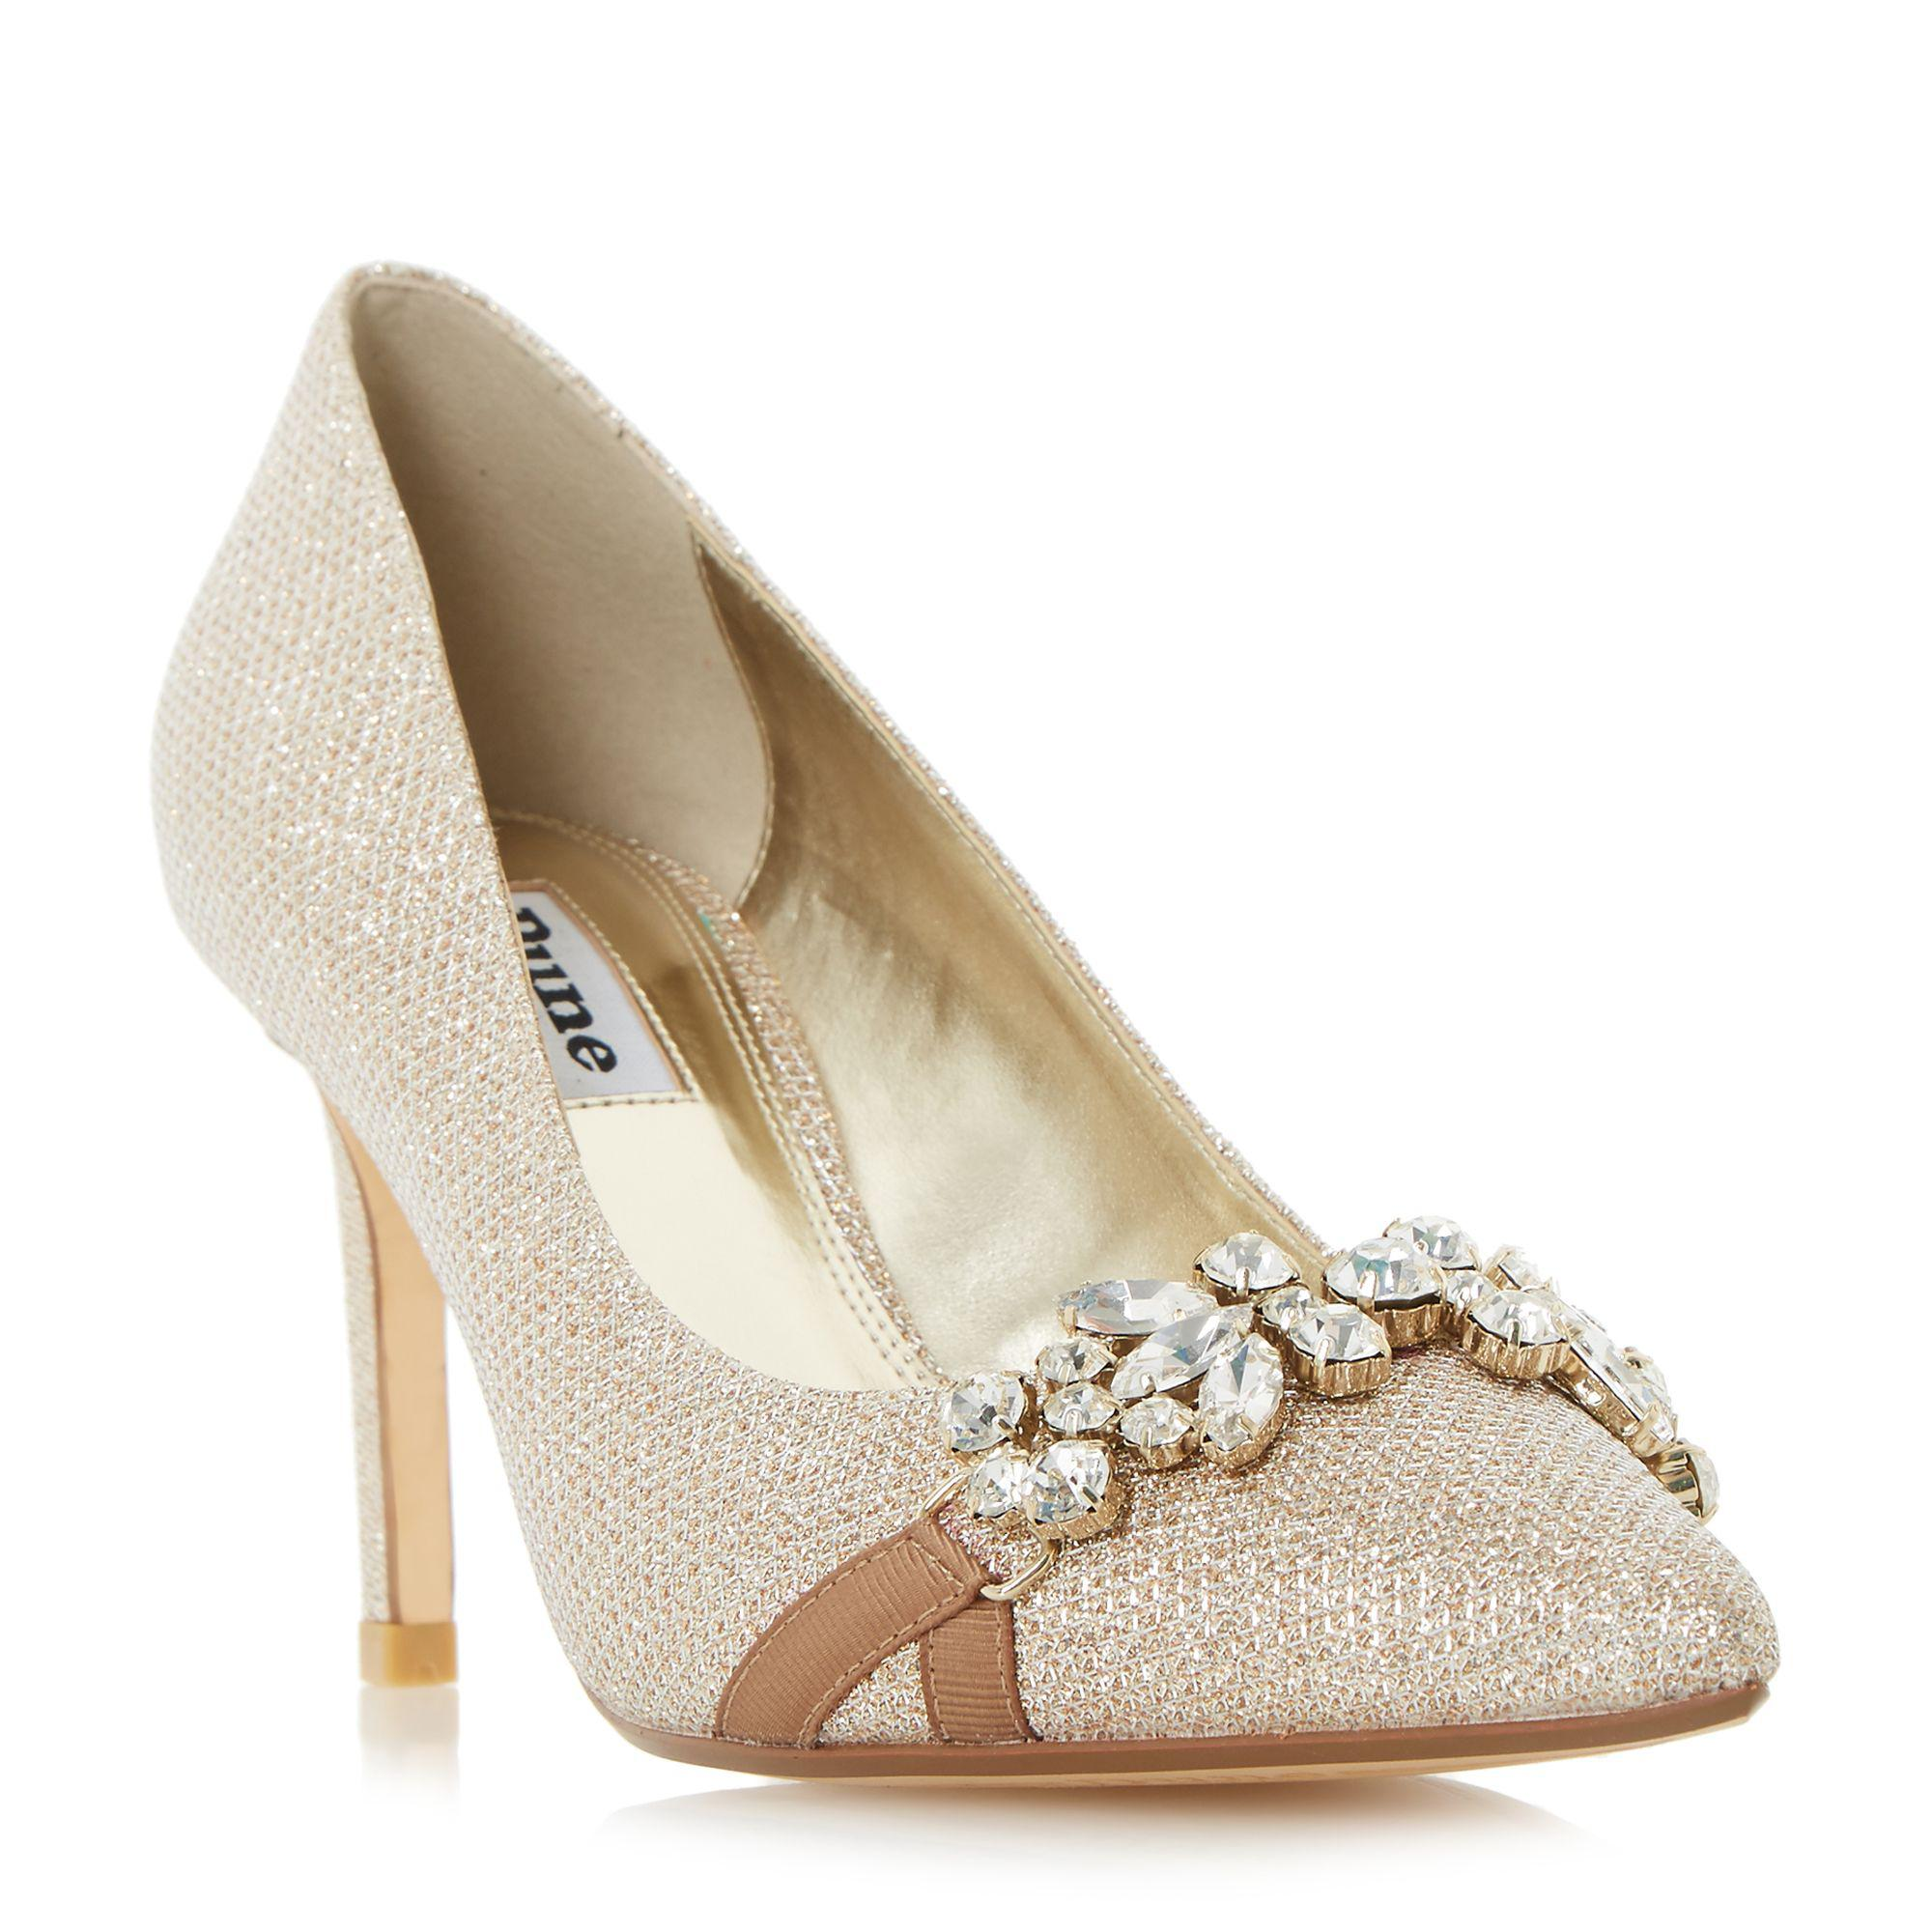 05dc0f4c1de Dune Gold  blair Di  Jewel Detail Pointed Toe Court Shoe in Metallic ...